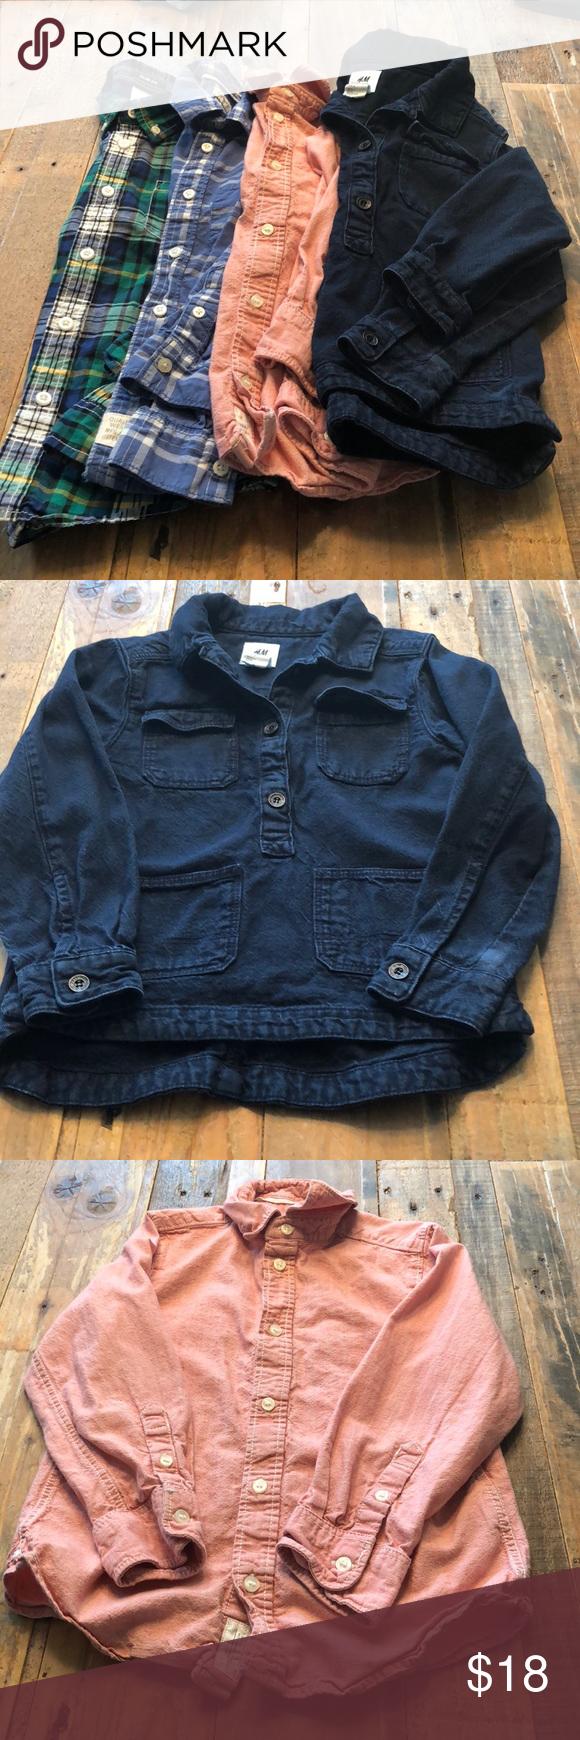 9d2bf67042e Back to school shirt bundle! 4 boys button down shirts. All in great shape. Dark  blue heavy denim shirt H M studio collection size 5-6yrs